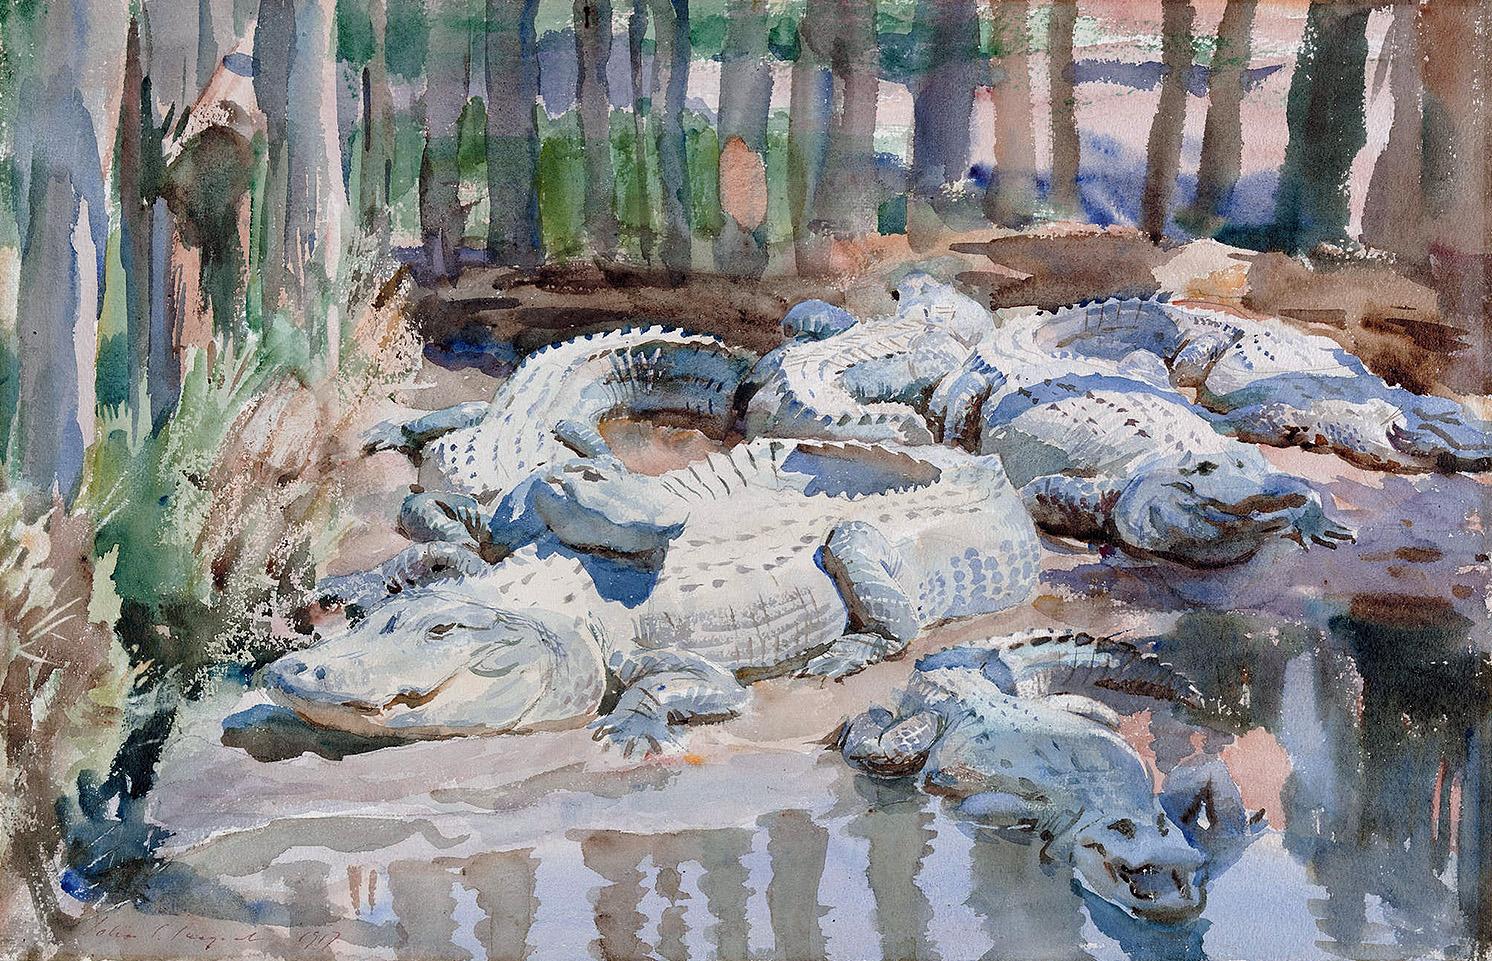 John Singer Sargent - Muddy Alligators.jpg